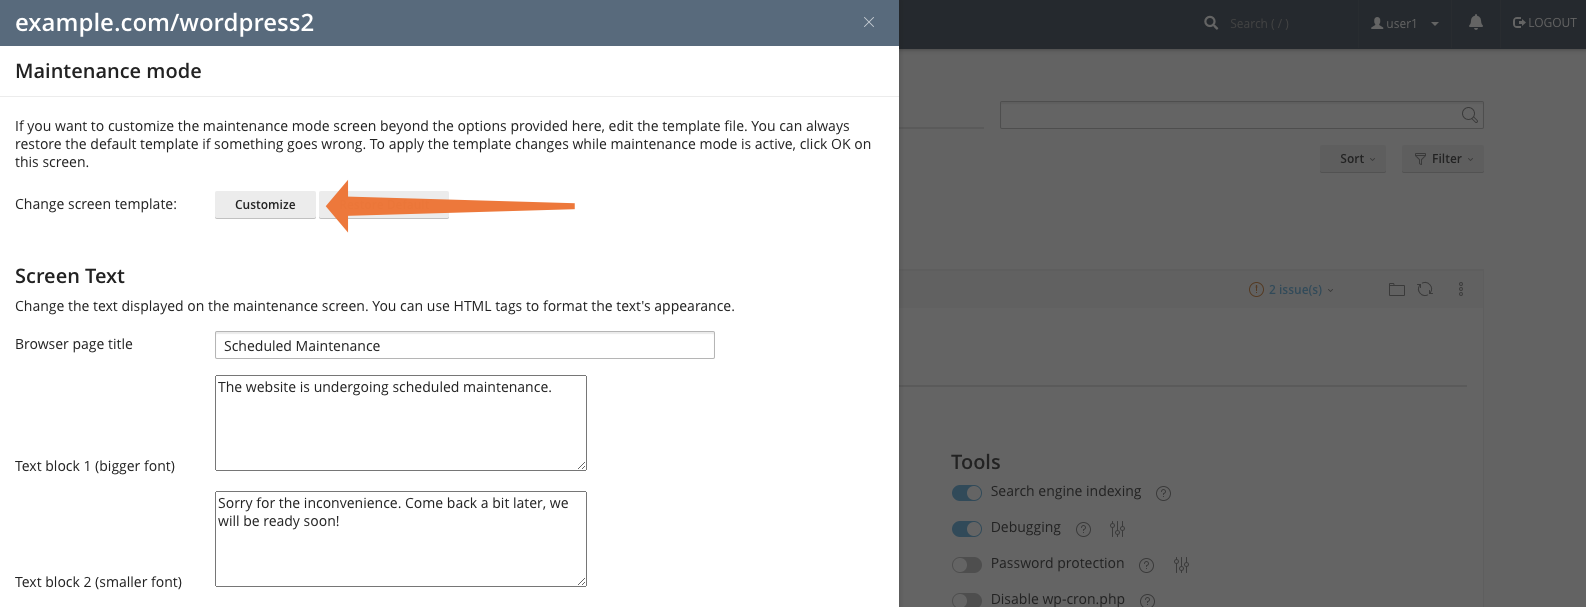 WordPress Toolkit for cPanel Customize Maintenance Mode